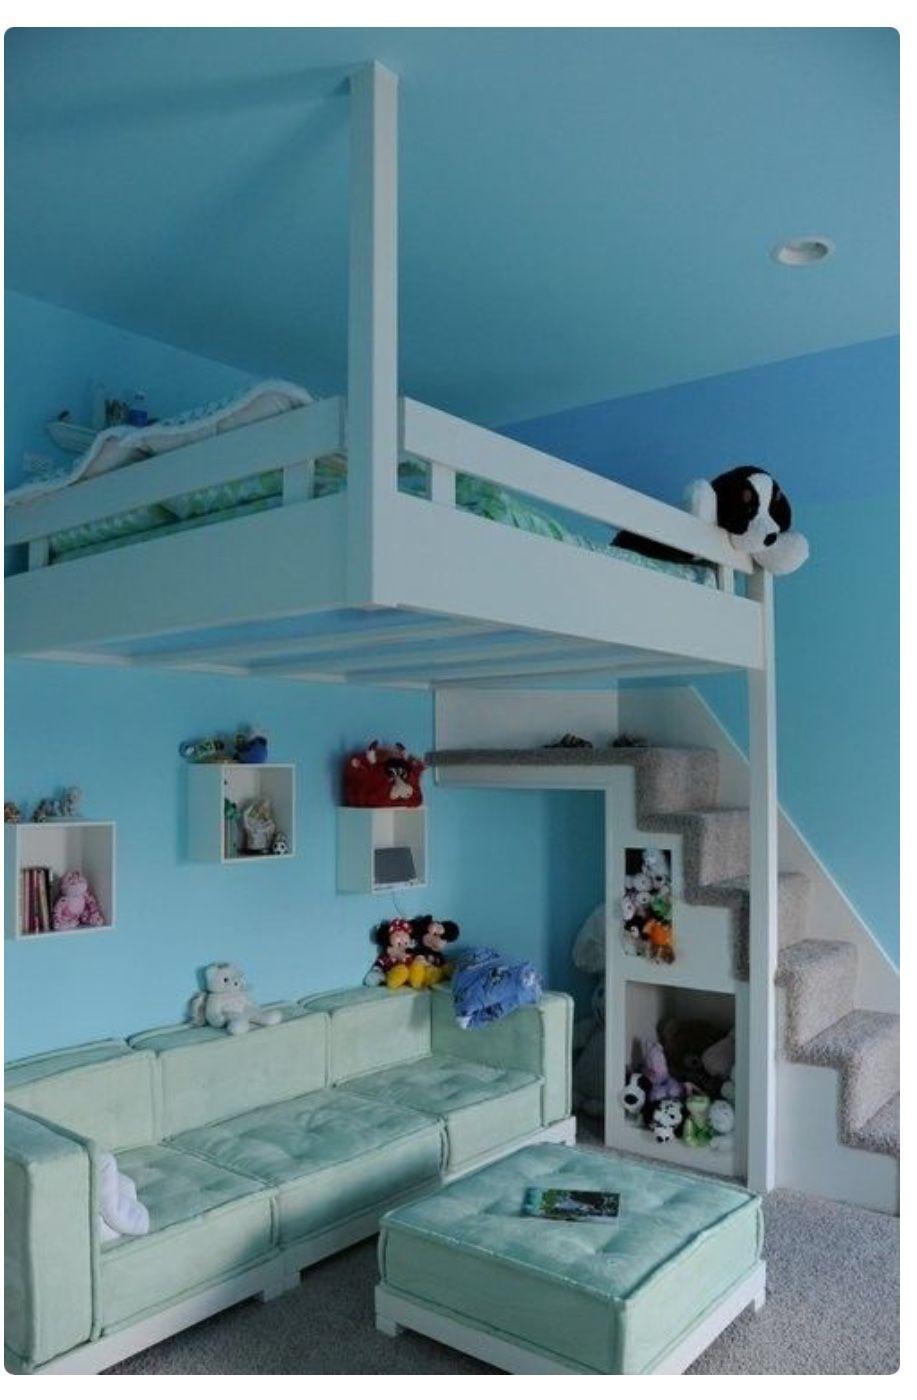 Loft bedroom ideas for teenage girls  Pin by Misty Angel Coleman on Bed  Pinterest  Bedrooms Room ideas